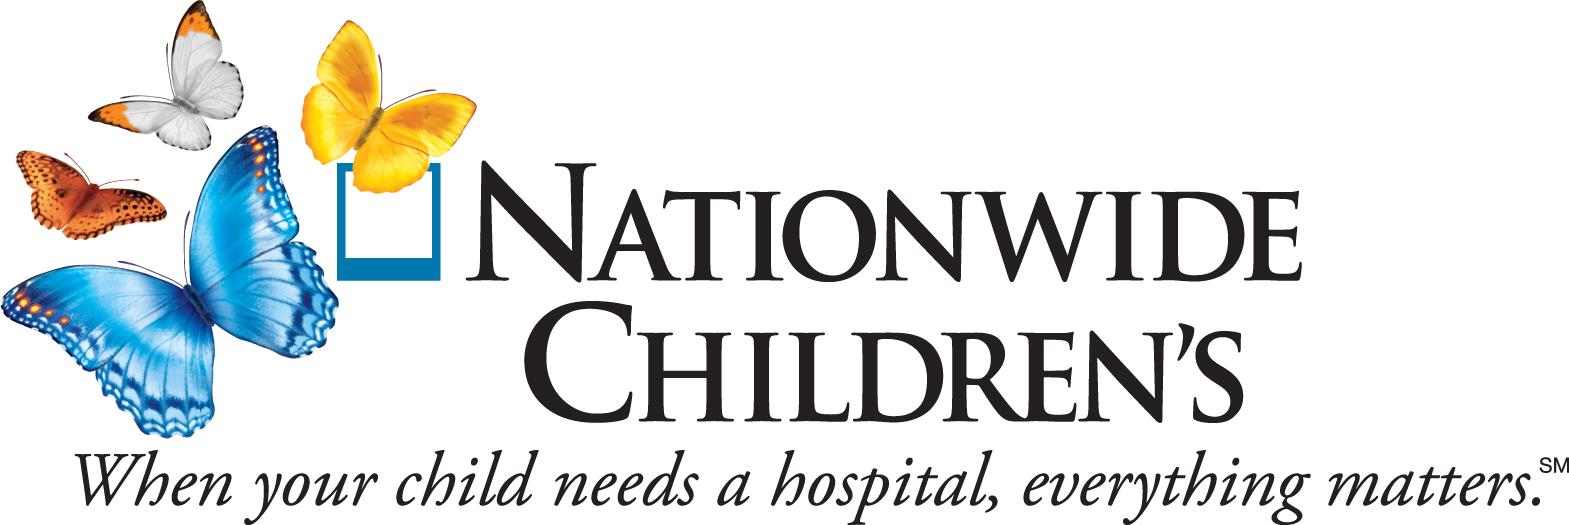 nationwide childrens hospital reviews